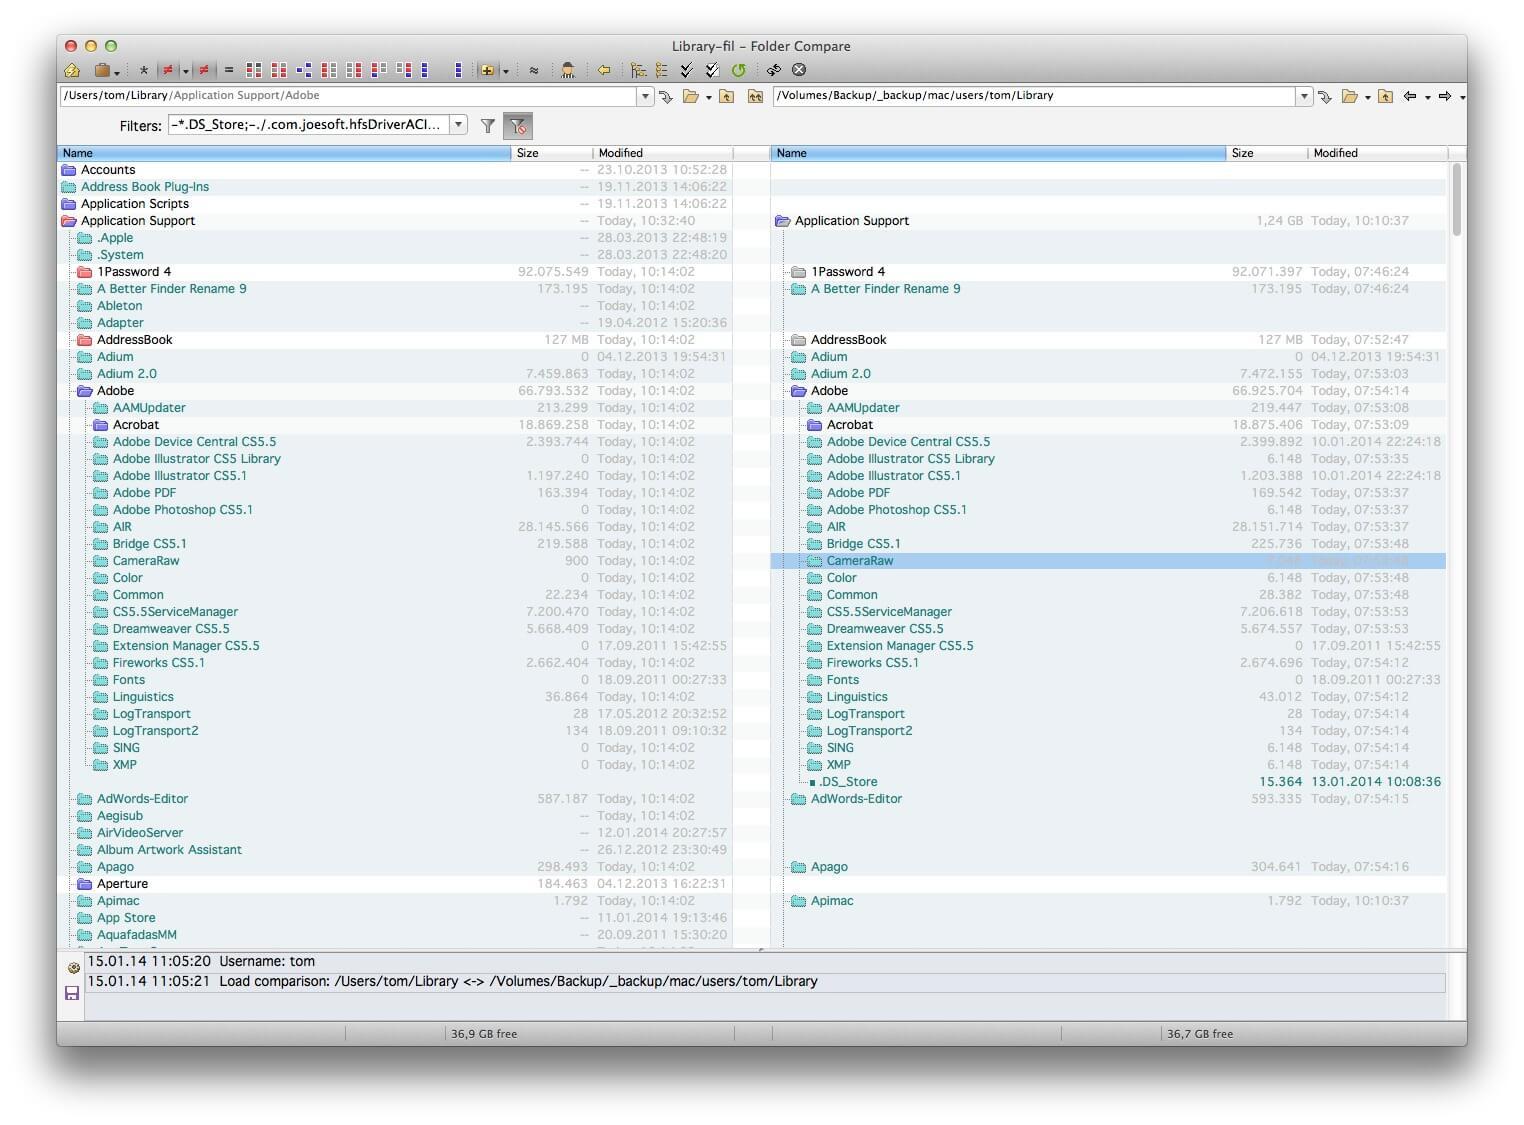 《Beyond Compare 4.2.3 for Mac 破解版 文件比较和合并文件夹》